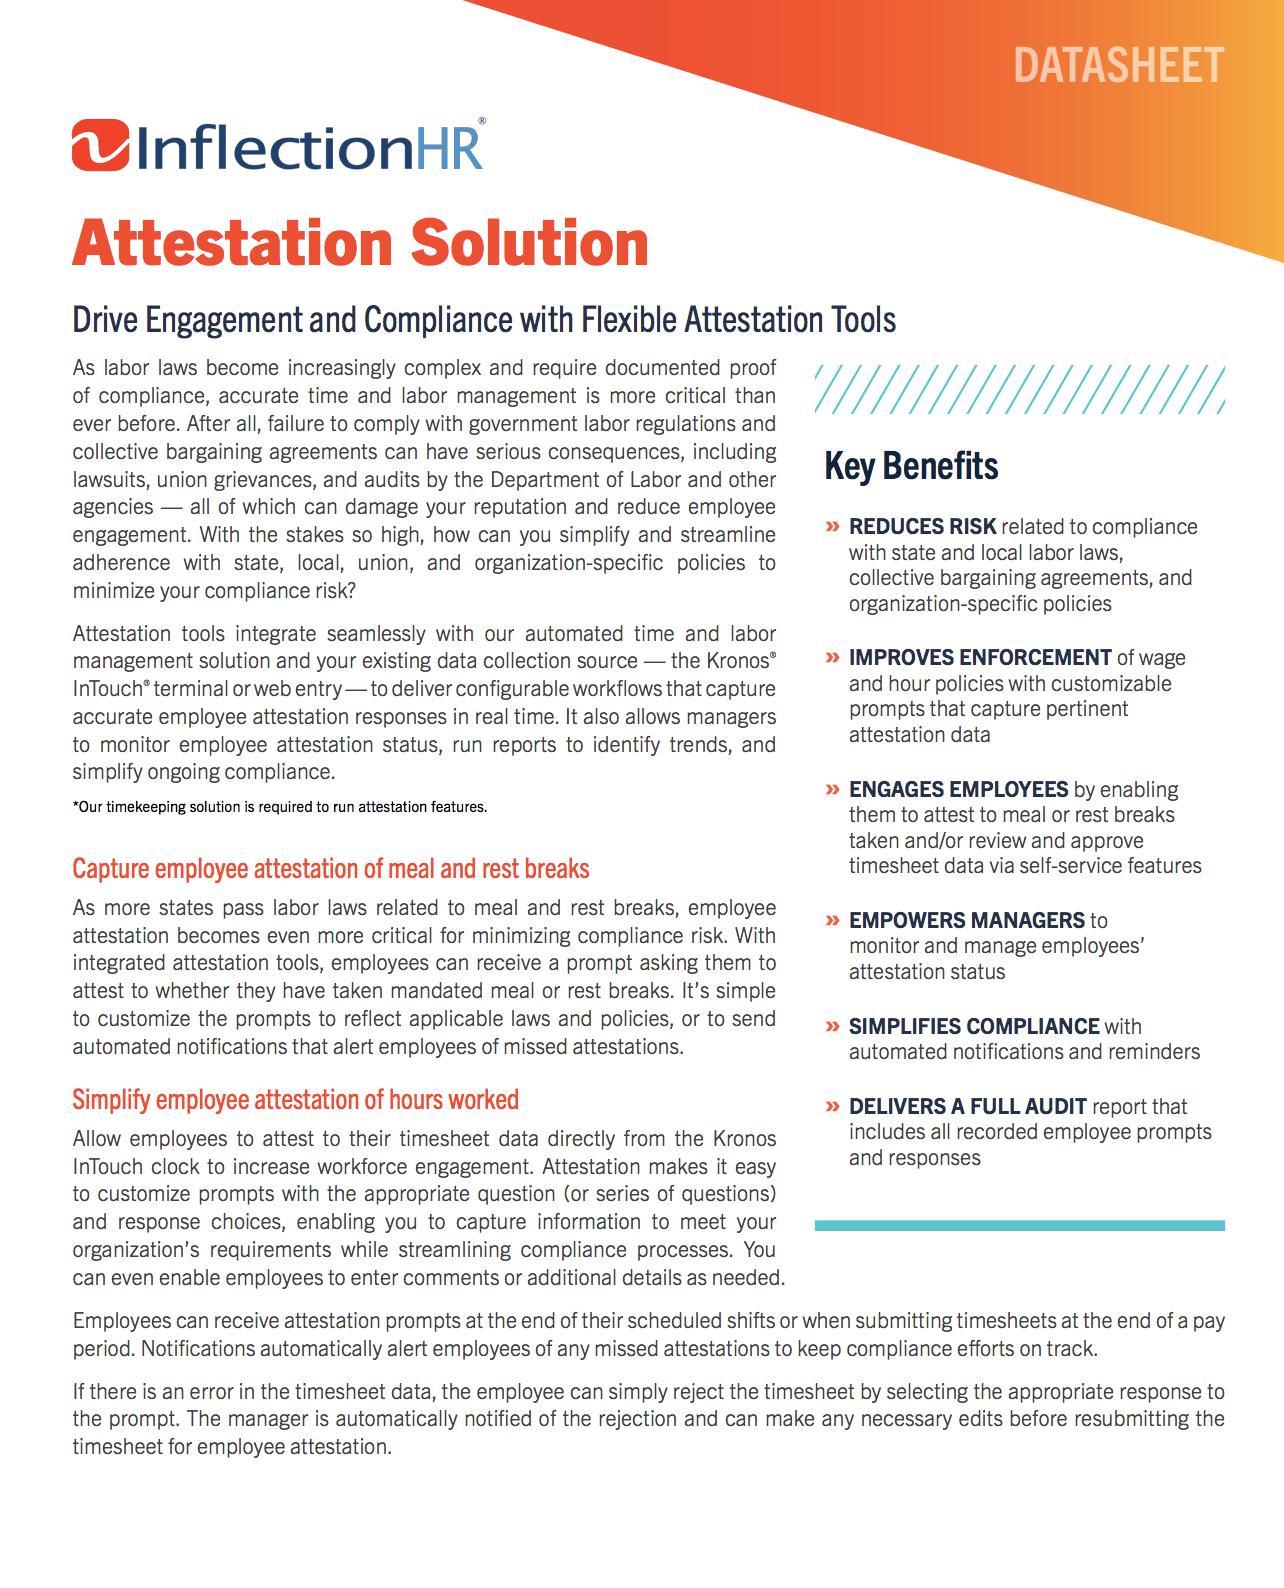 Attestation Solution Datasheet | Inflection HR